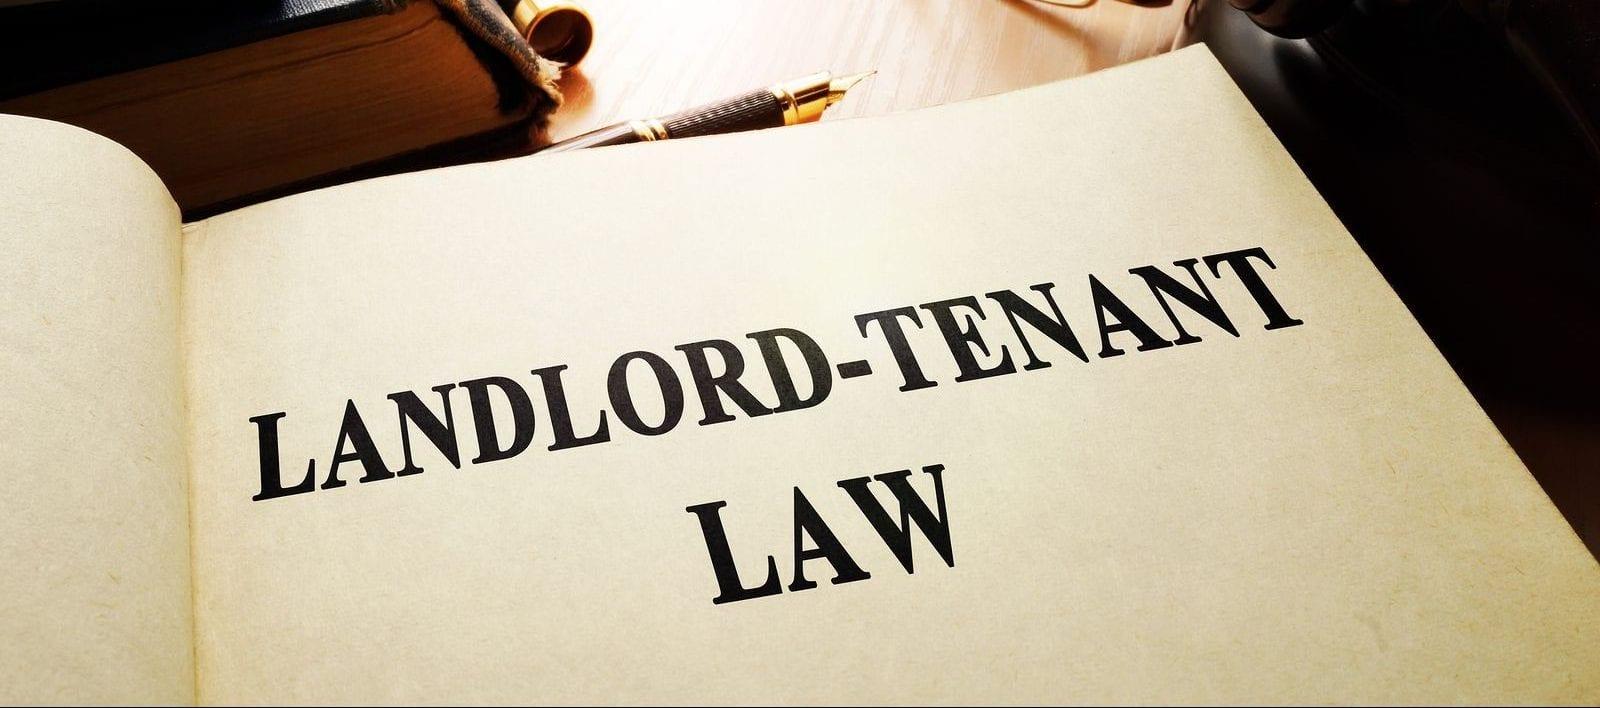 Oregon Landlord-Tenant Law Handbook